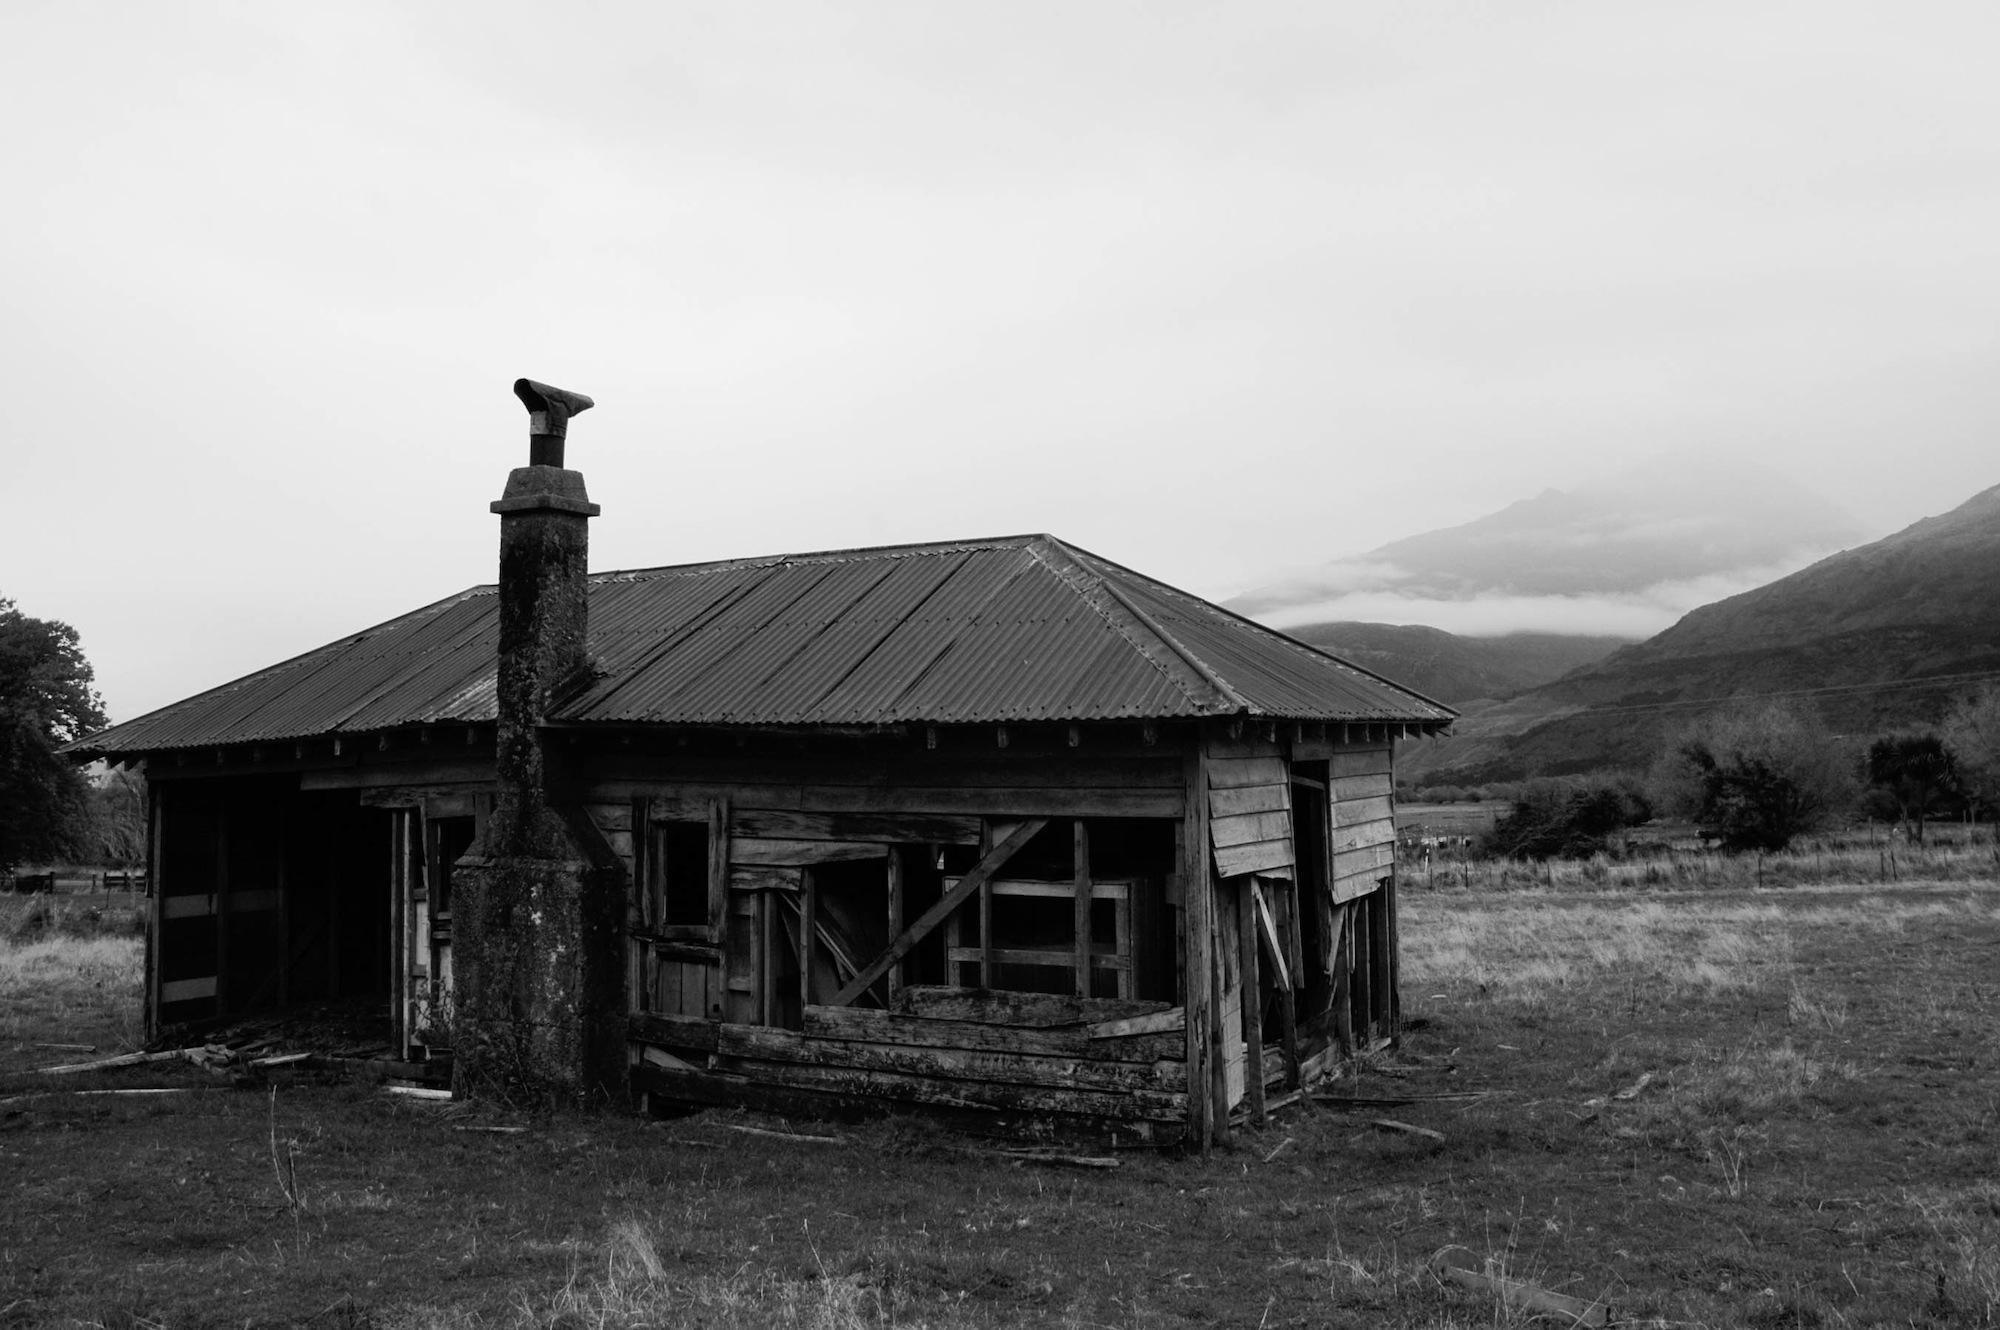 abandoned_house_new zealand_ben_howe_12.jpg